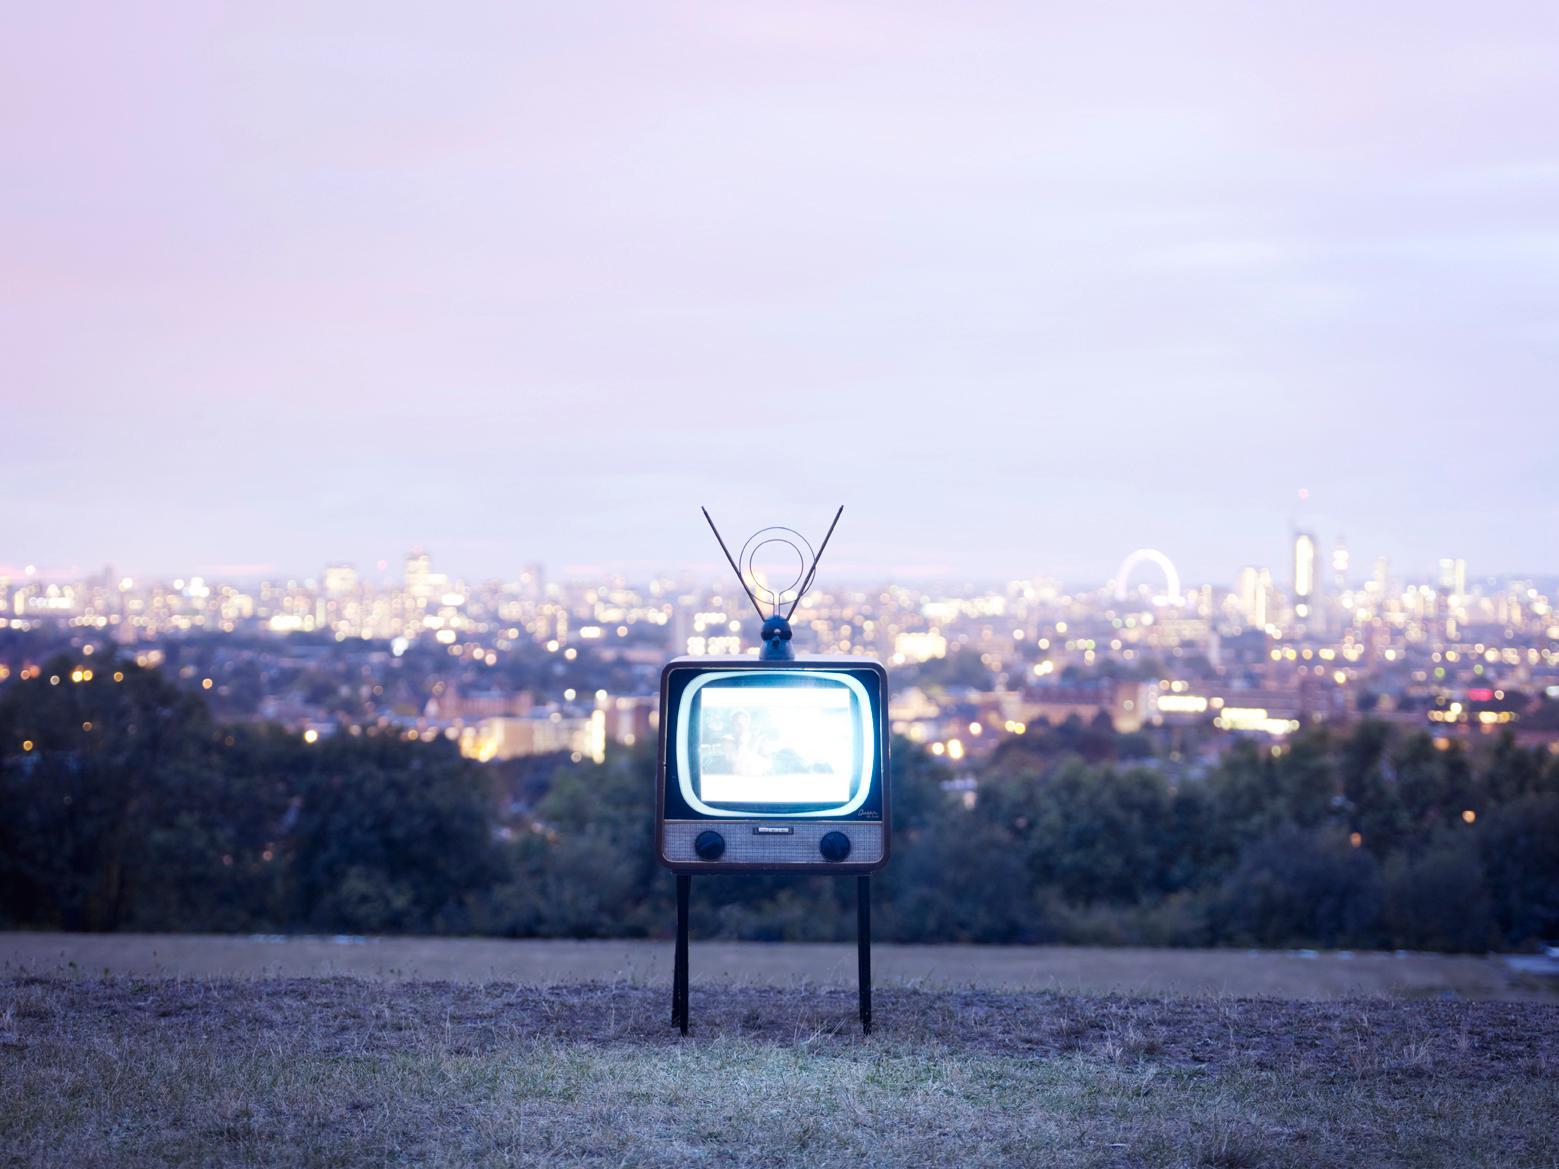 TV 1 - Samuel Hicks, London, Landscape, Nature, Floral, Contemporary Photography